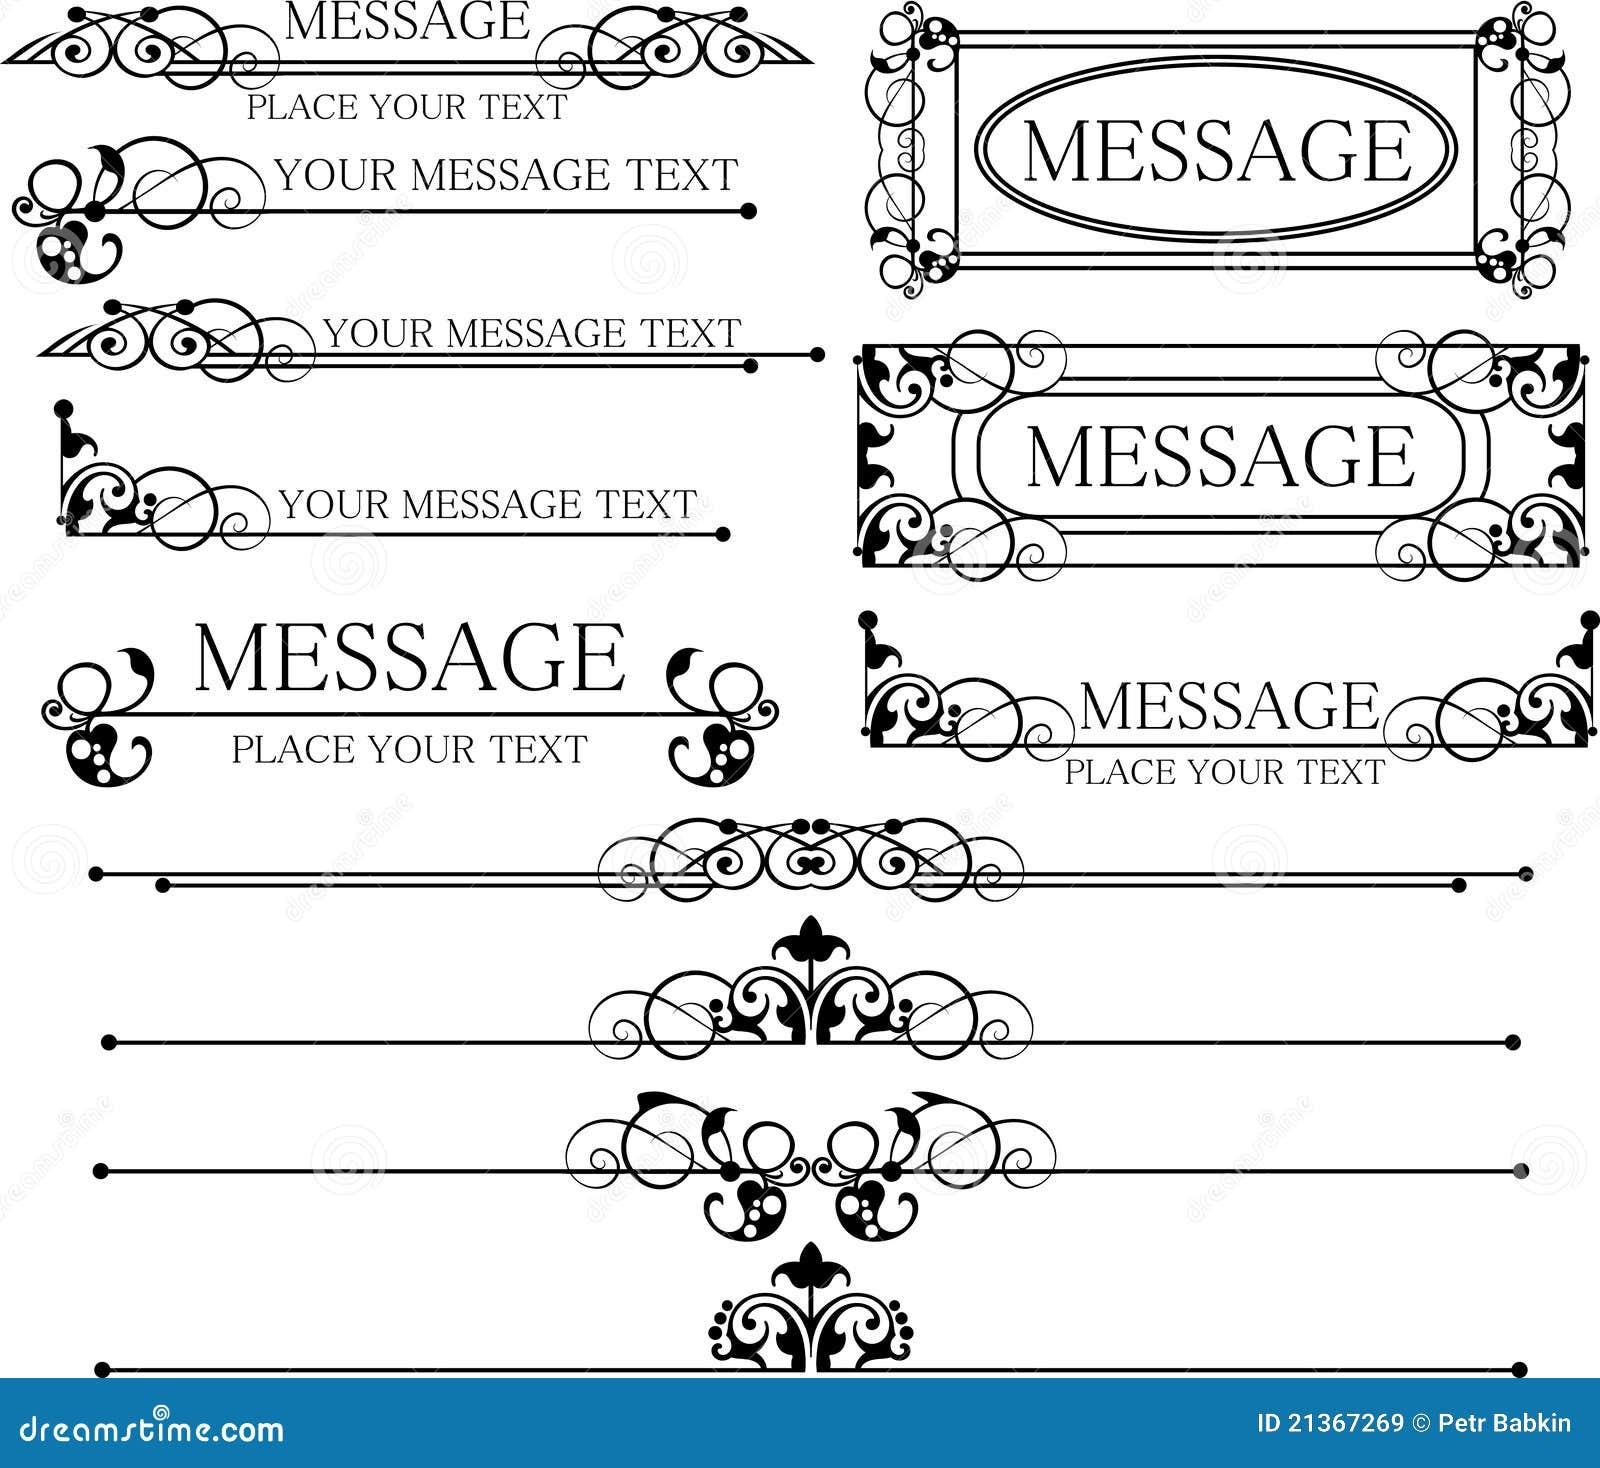 Decorative elements vintage royalty free stock images for Decoration elements